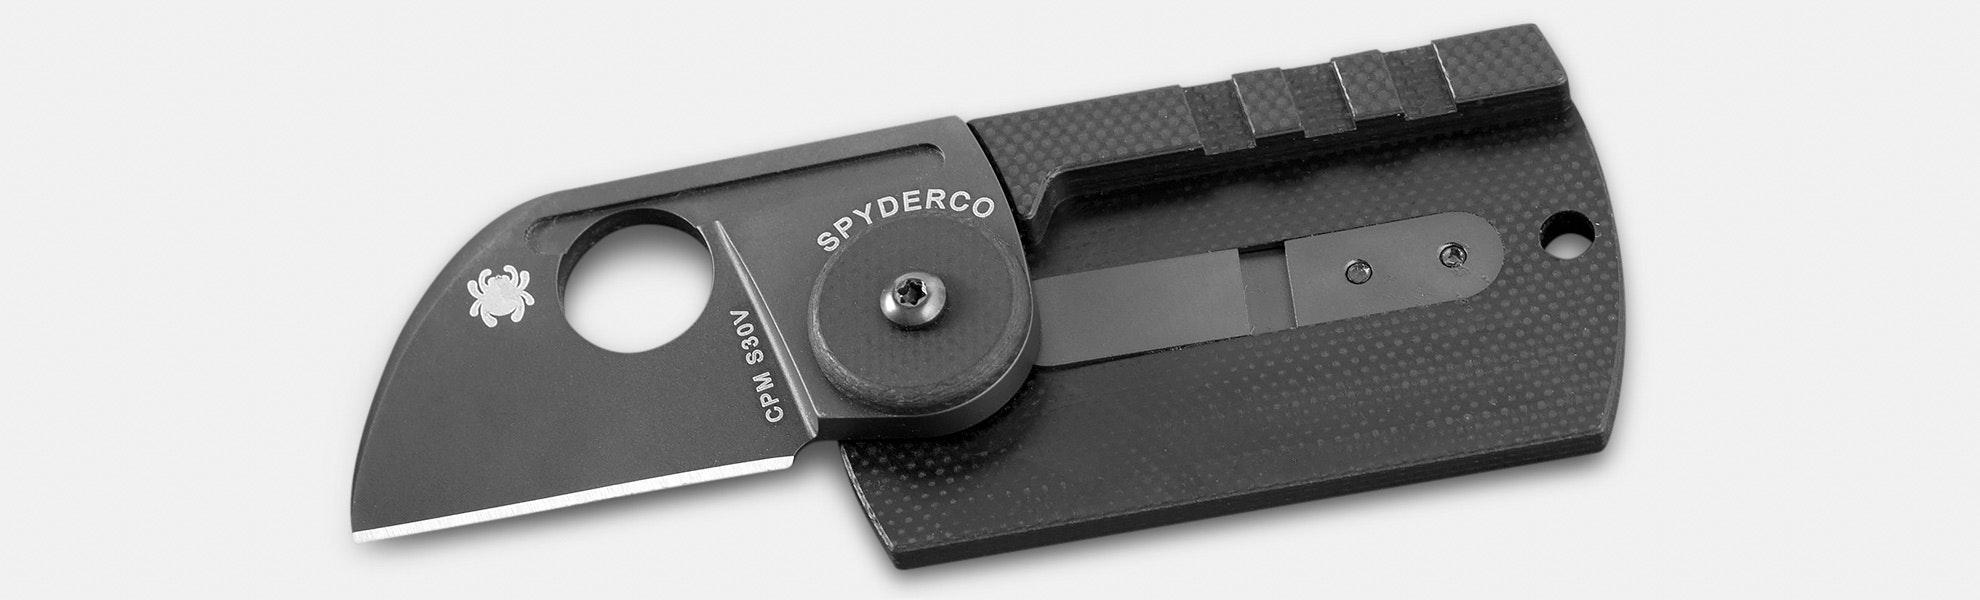 Spyderco Carbon Fiber Dog Tag Folder